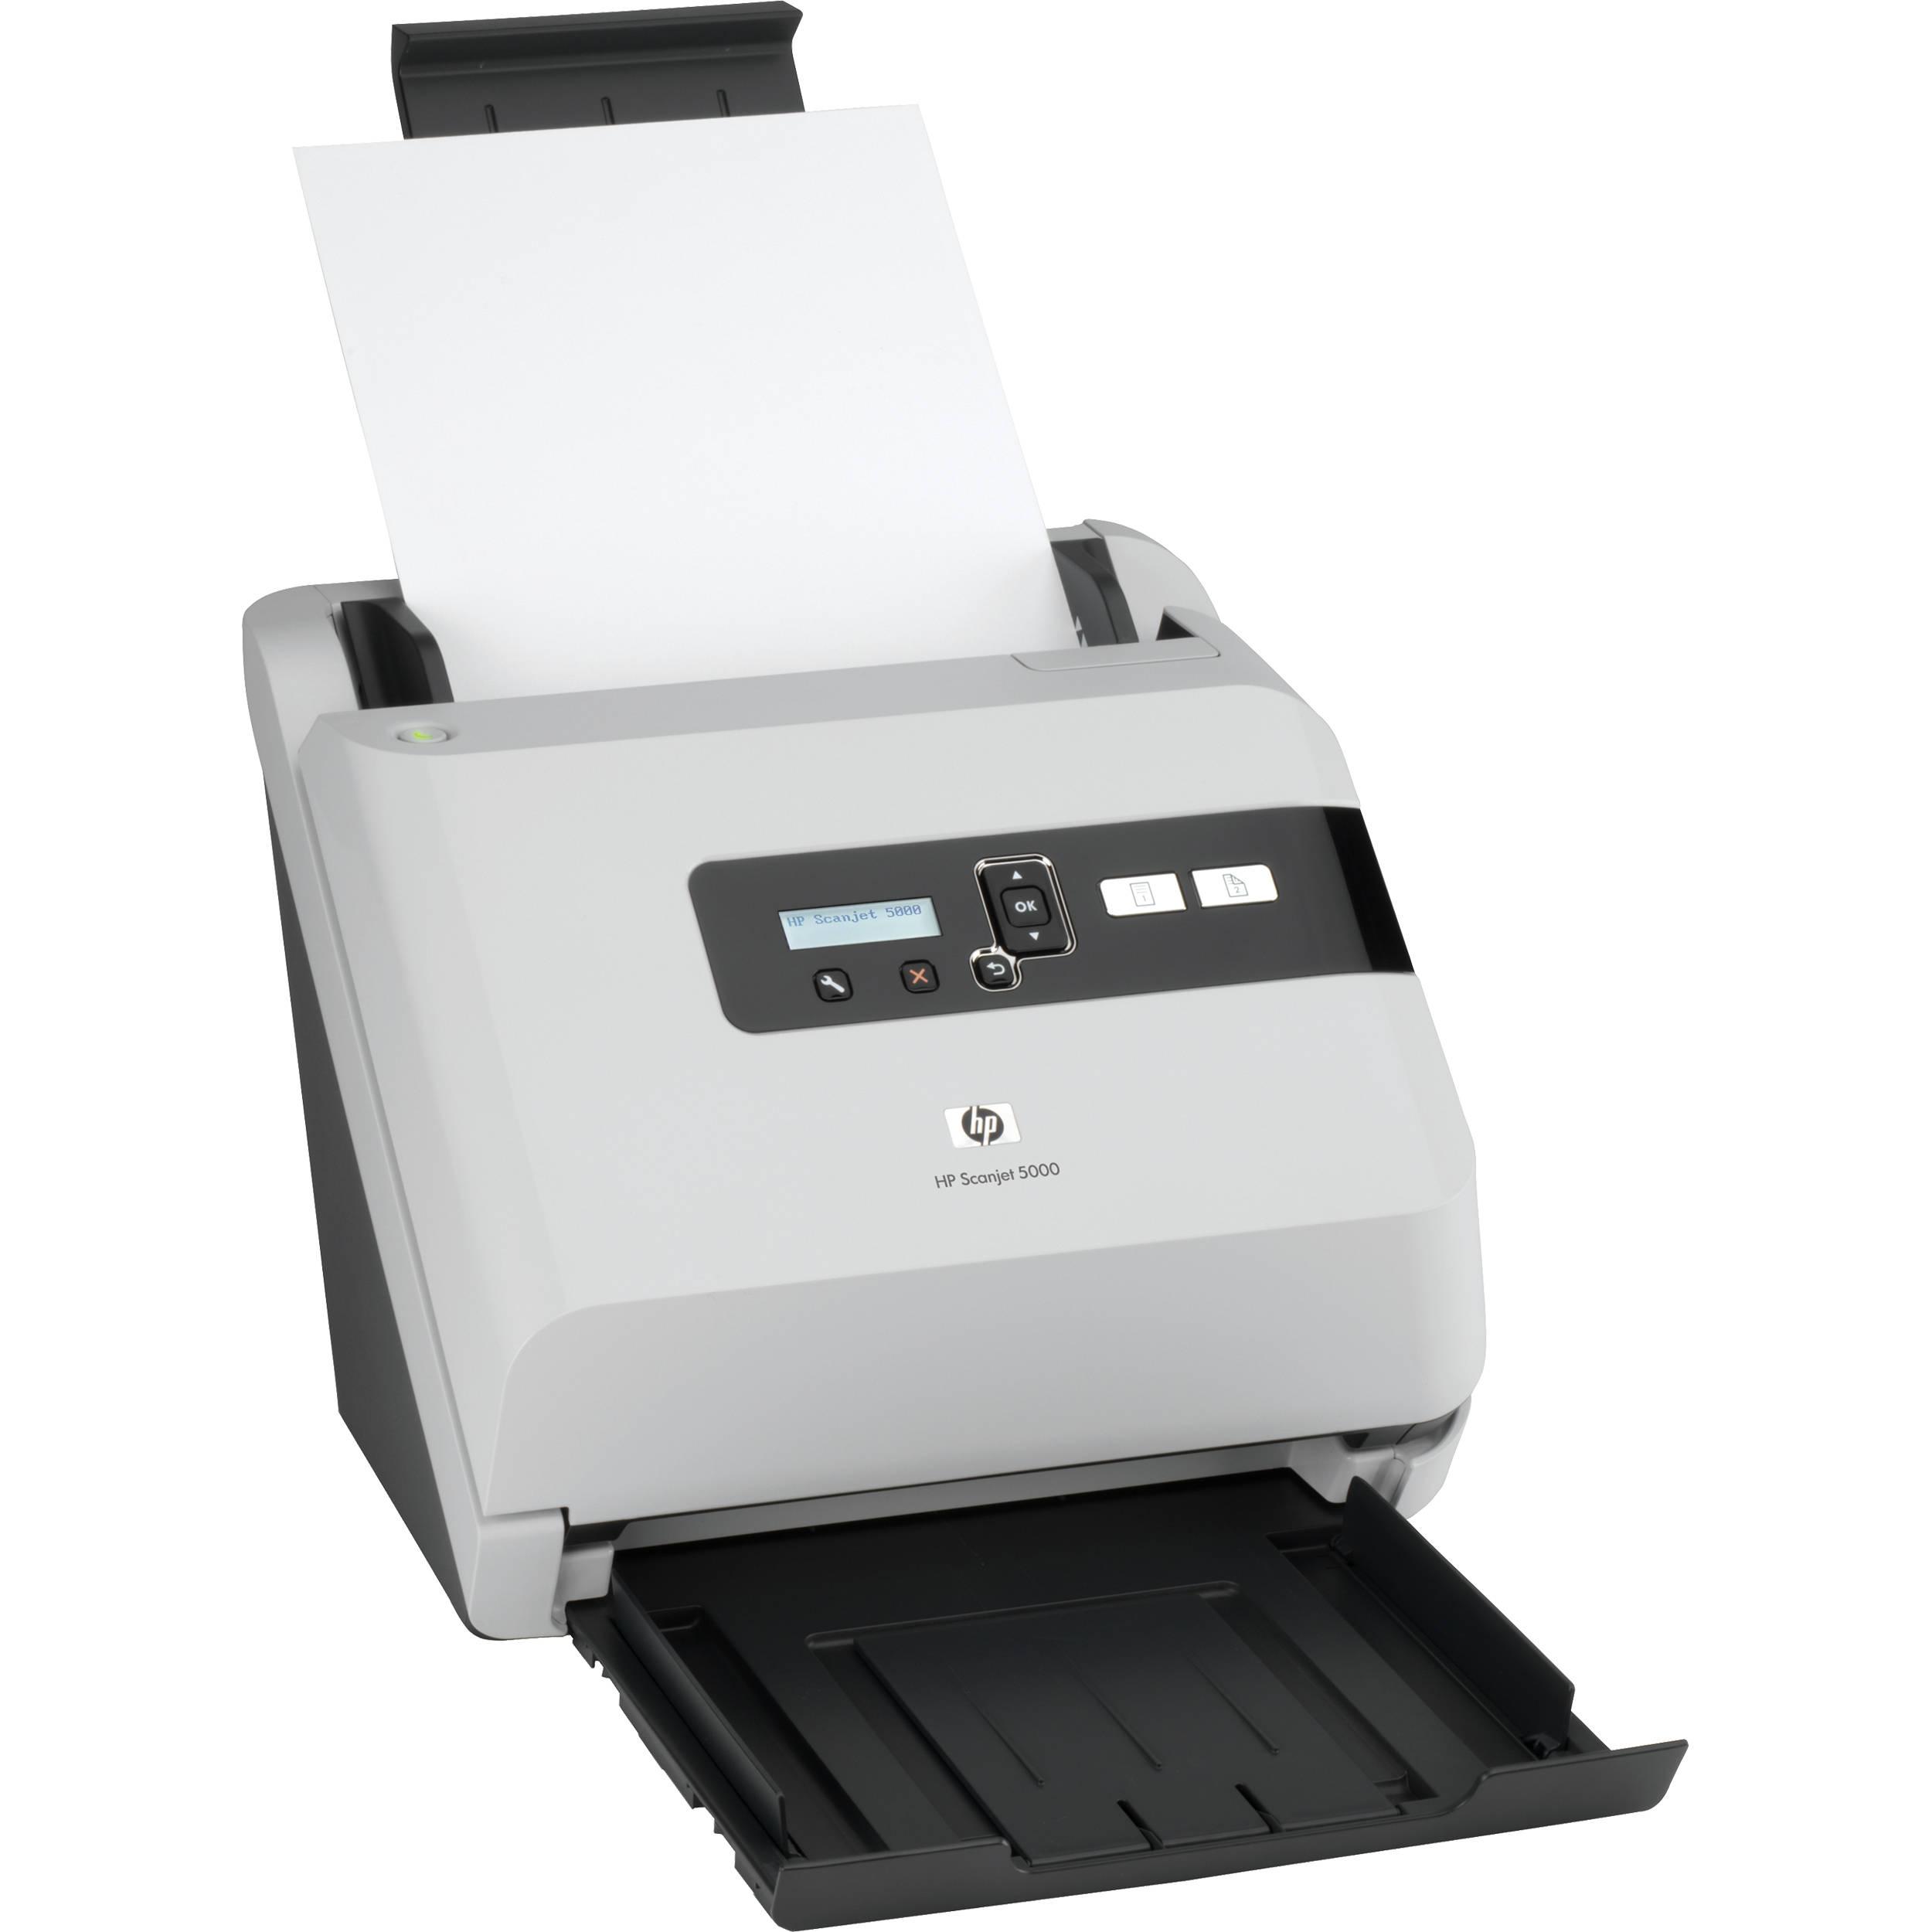 HP SCANJET 5000 TWAIN TREIBER WINDOWS 7